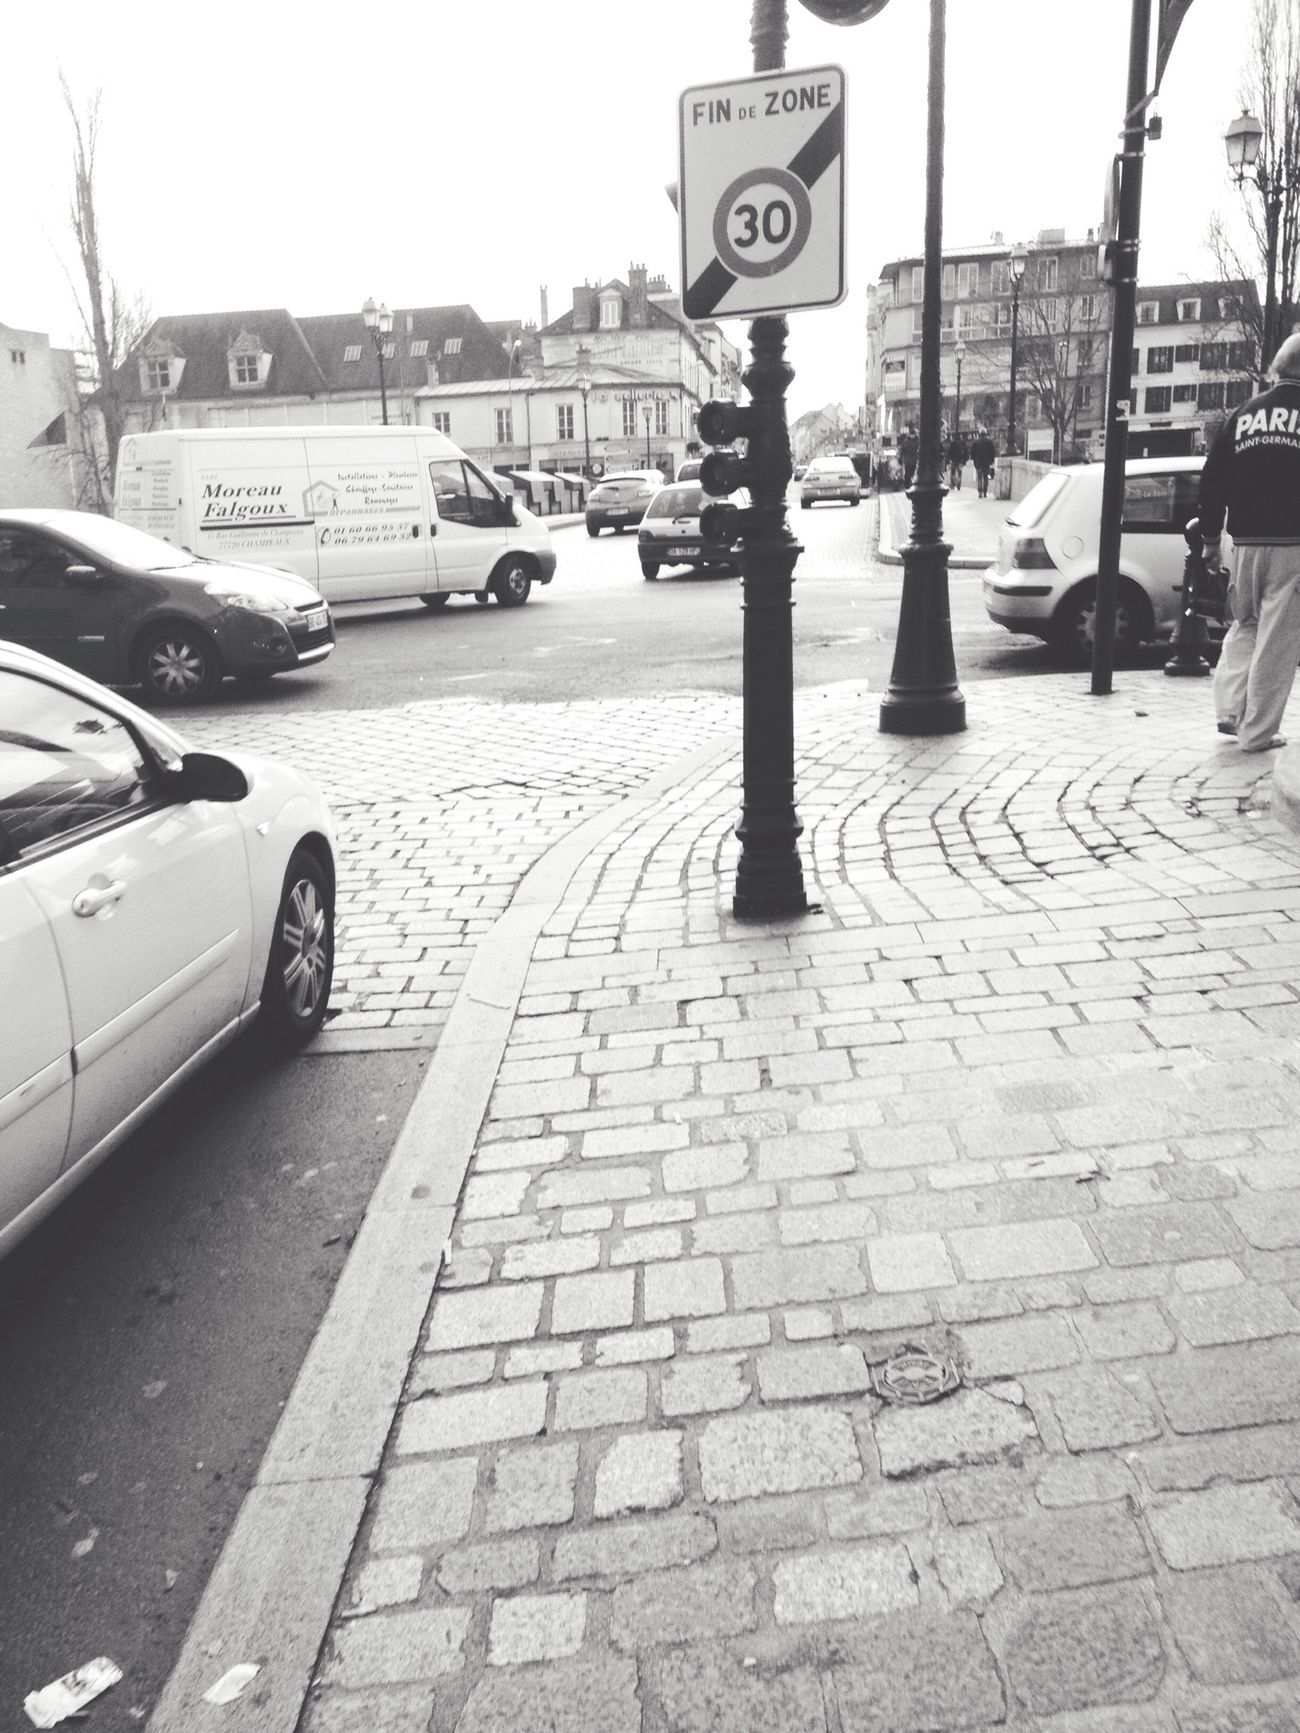 Blackandwhite Street Art Streetphotography Street Photography Followbacks Enjoying Life Hello World IPhone